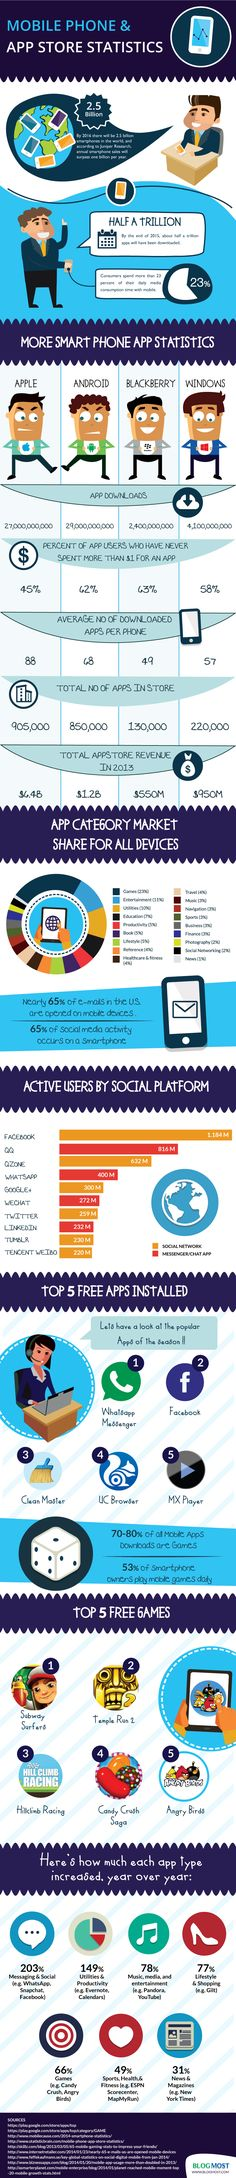 Mobile Phone & App Store Statistics Infographic